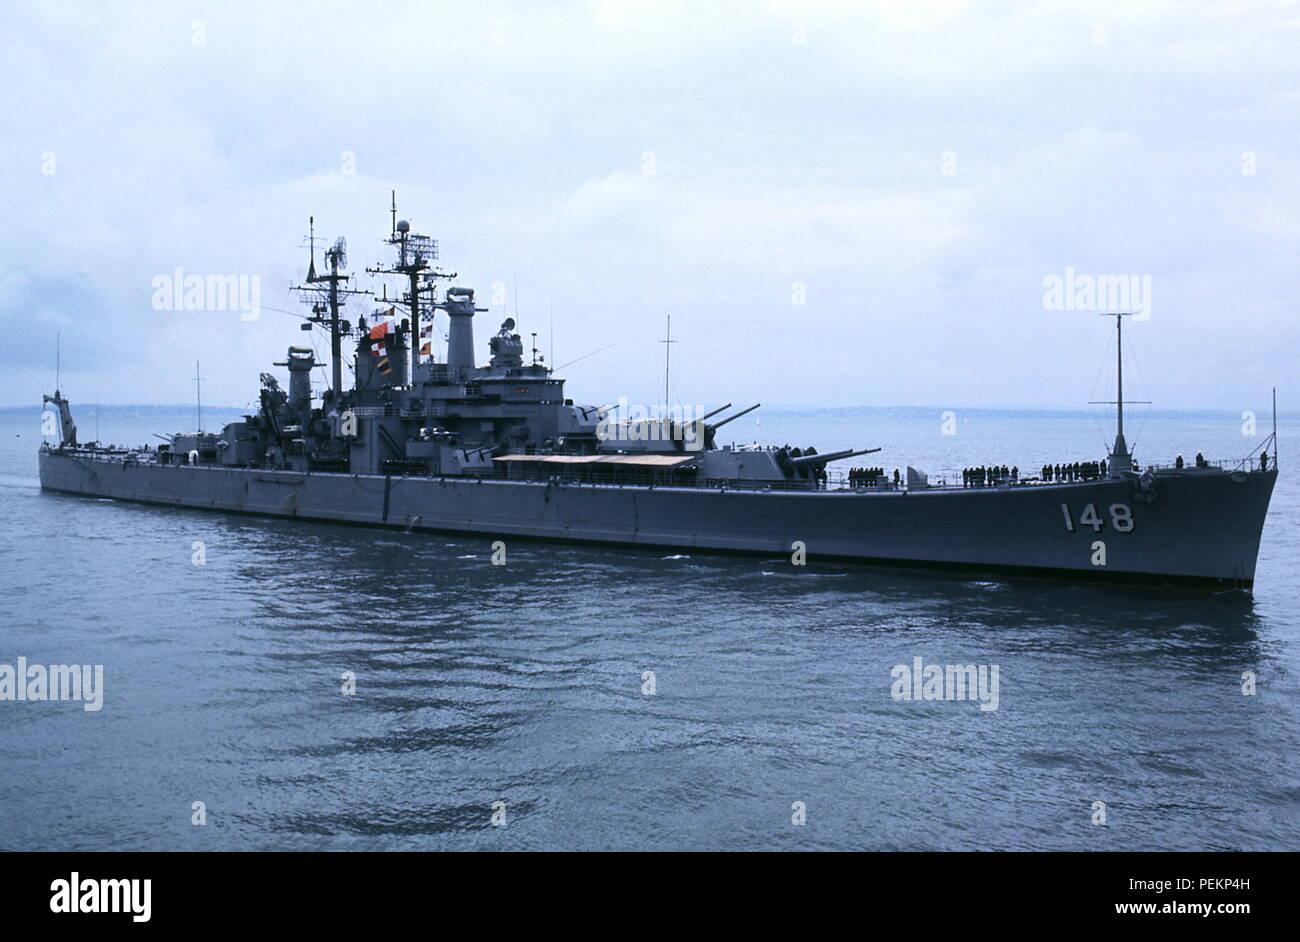 AJAXNETPHOTO. 1973. PORTSMOUTH, ENGLAND. - US VISITOR - DES MOINES CLASS BATTLECRUISER USS NEWPORT NEWS (21,000 TONS) ENTERING PORTSMOUTH NAVAL BASE. PHOTO:JONATHAN EASTLAND/AJAX REF:300593 Stock Photo